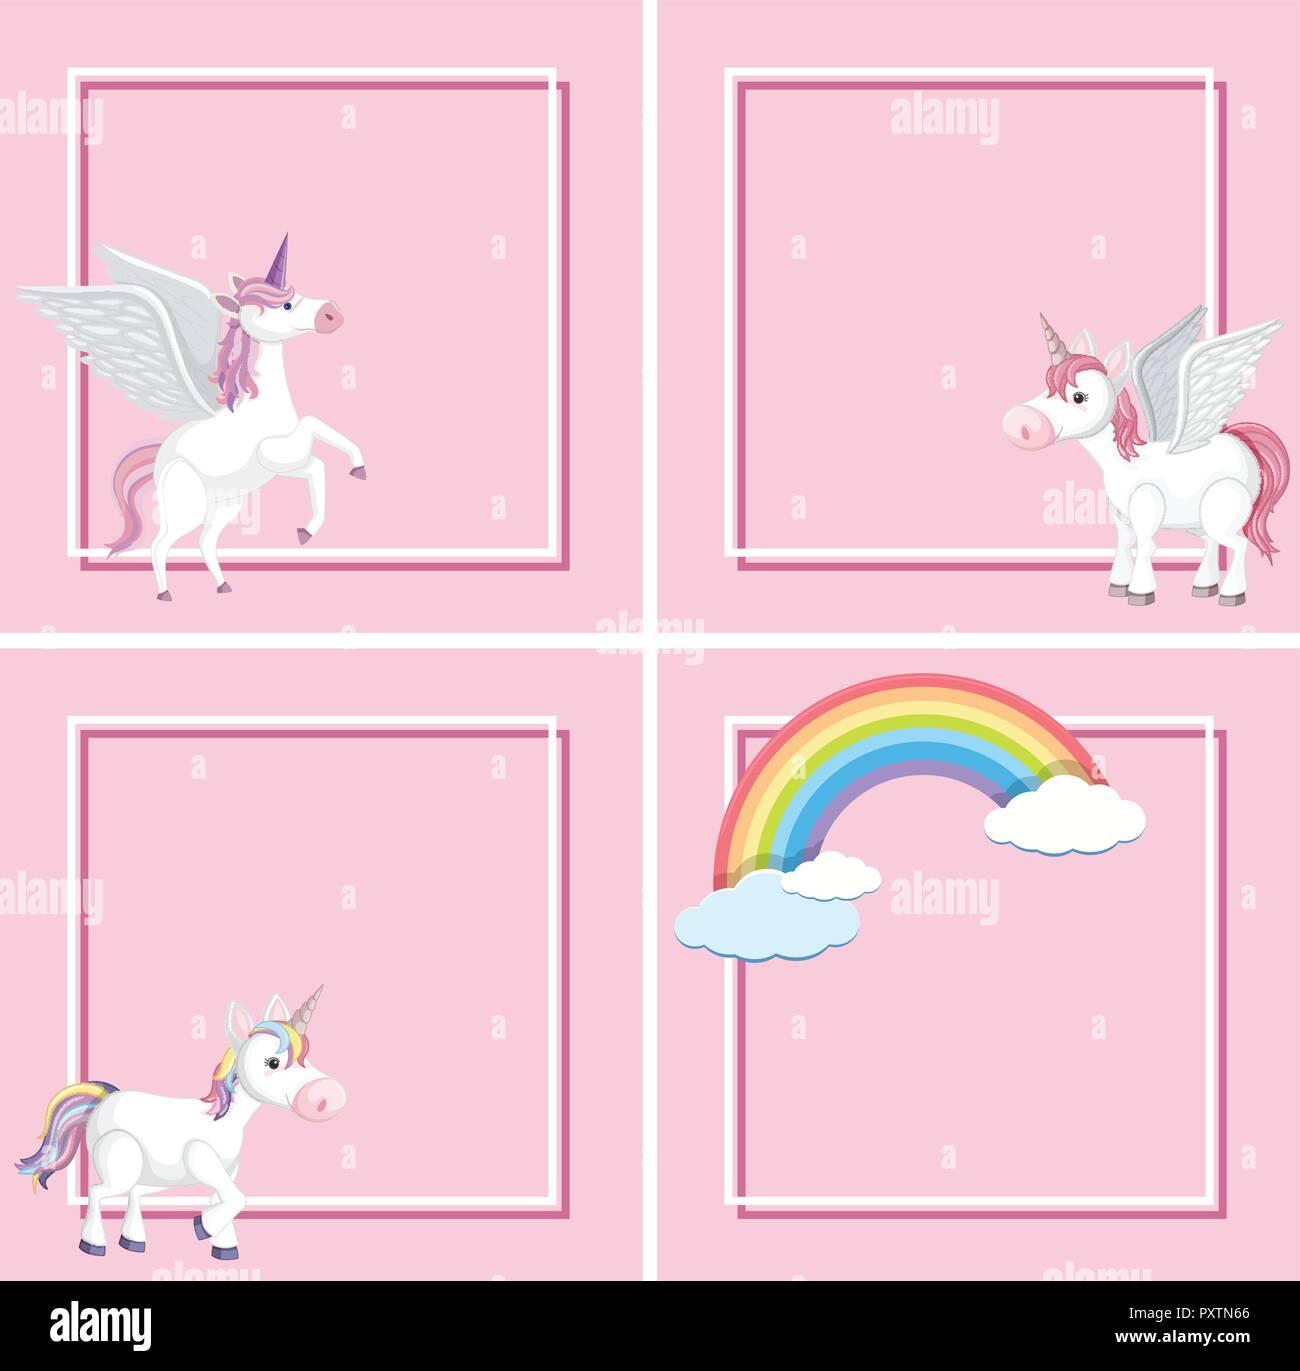 Unicorn Template On Pink Background Illustration Stock Vector Image Art Alamy